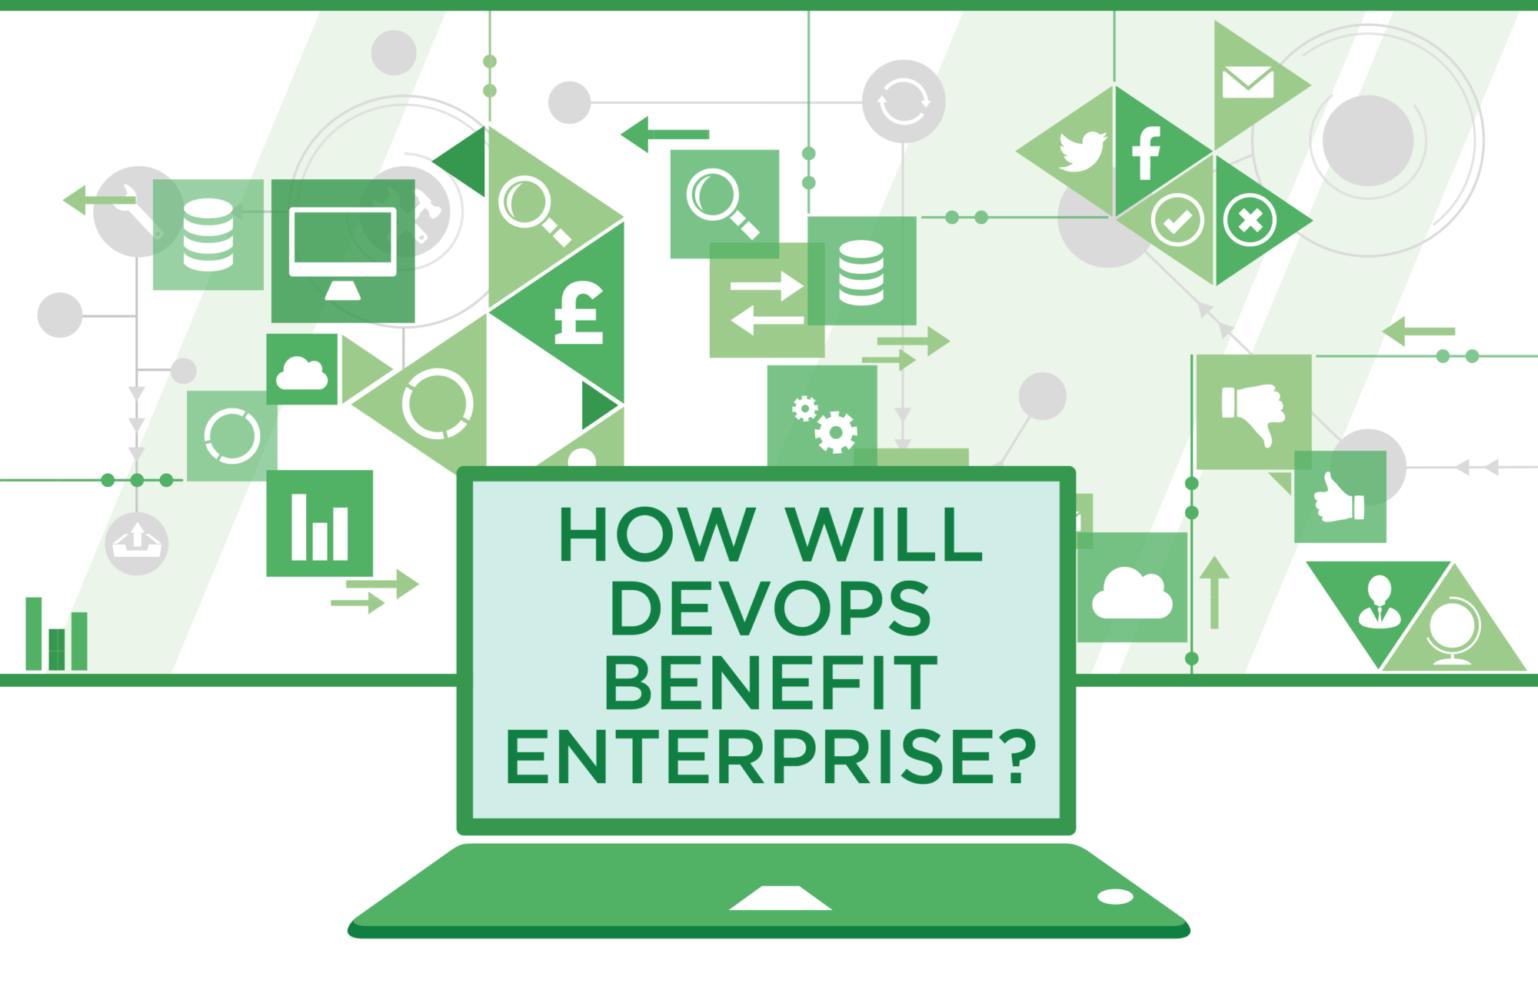 Infographic thumbnail for How will DevOps benefit enterprise